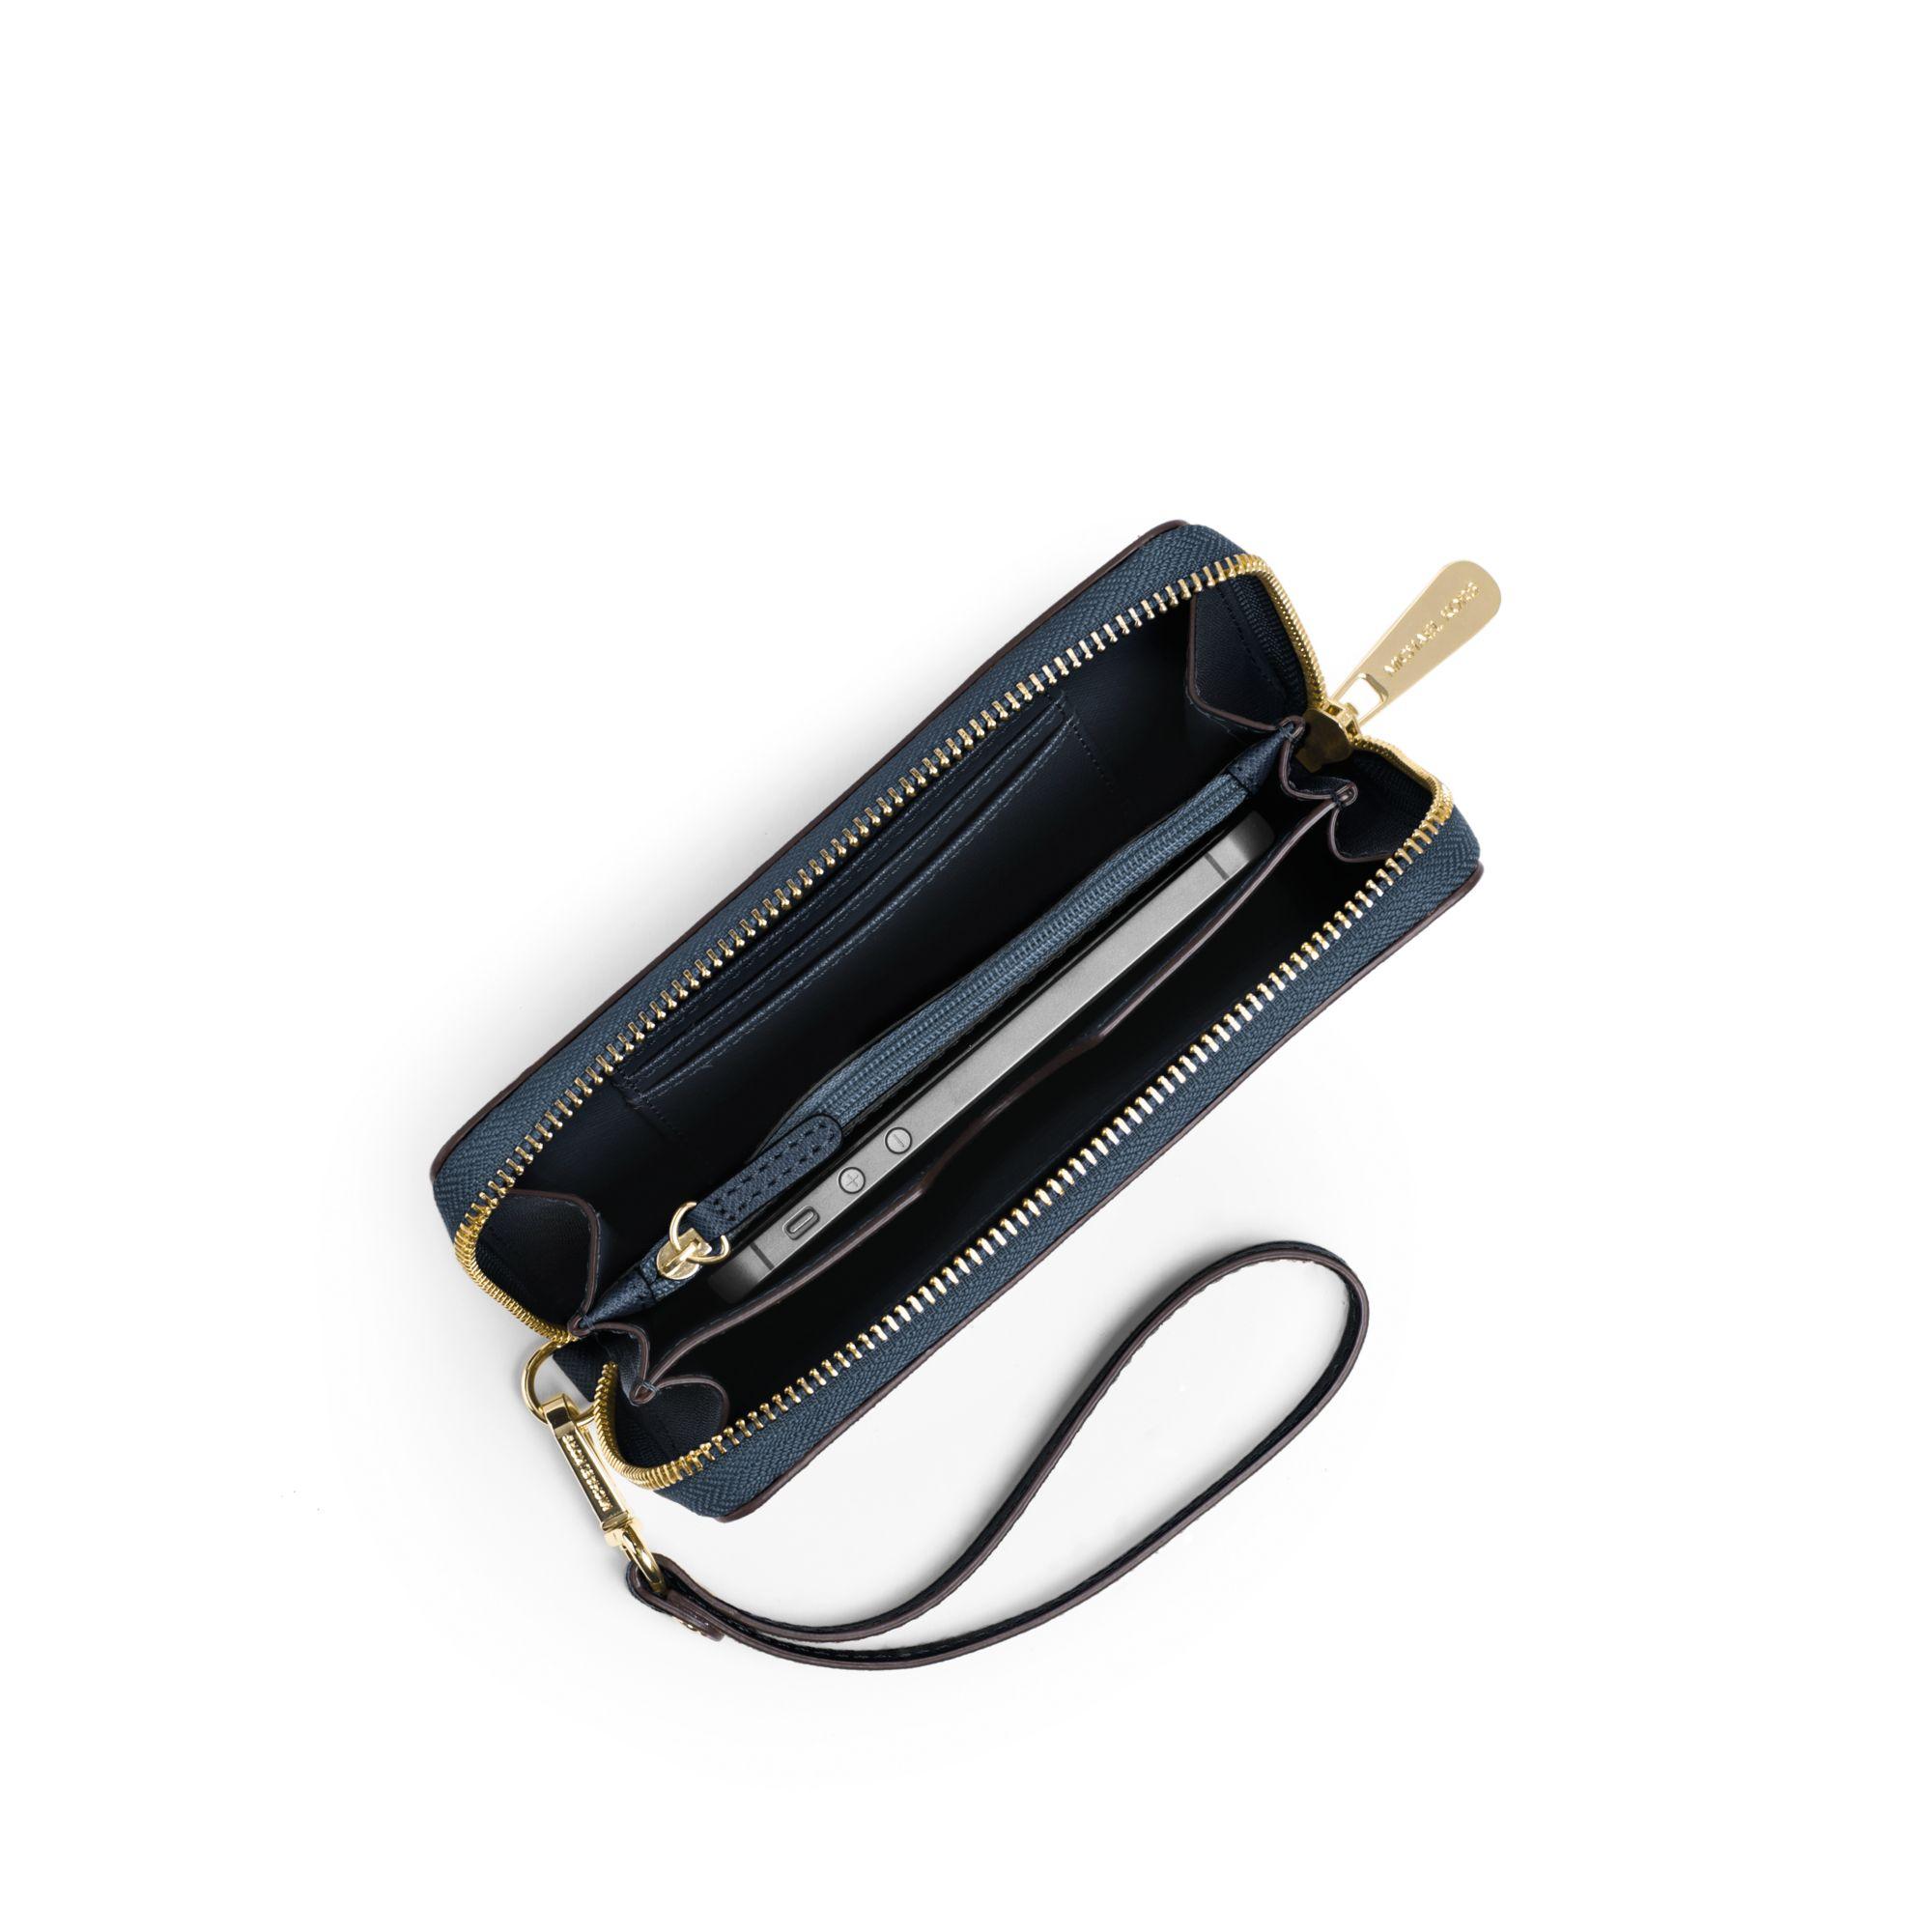 a71bc572b413 michael kors jet set travel large smartphone wristlet luggage ...